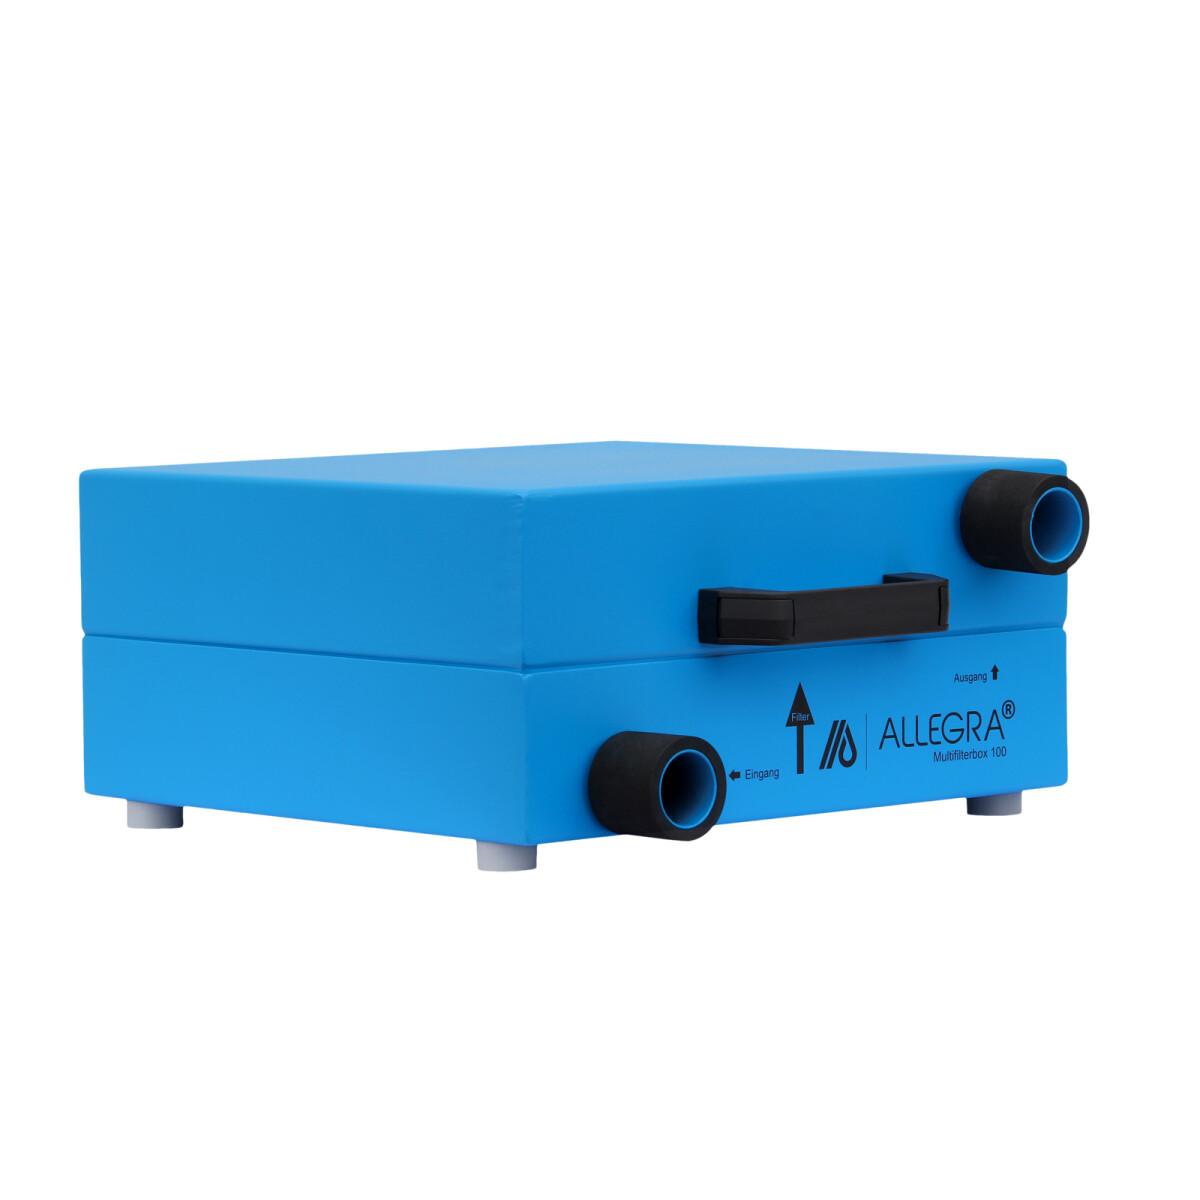 ALLEGRA Multifilterbox 100 mit Hepa-Filter, Anschluss: 50 mm